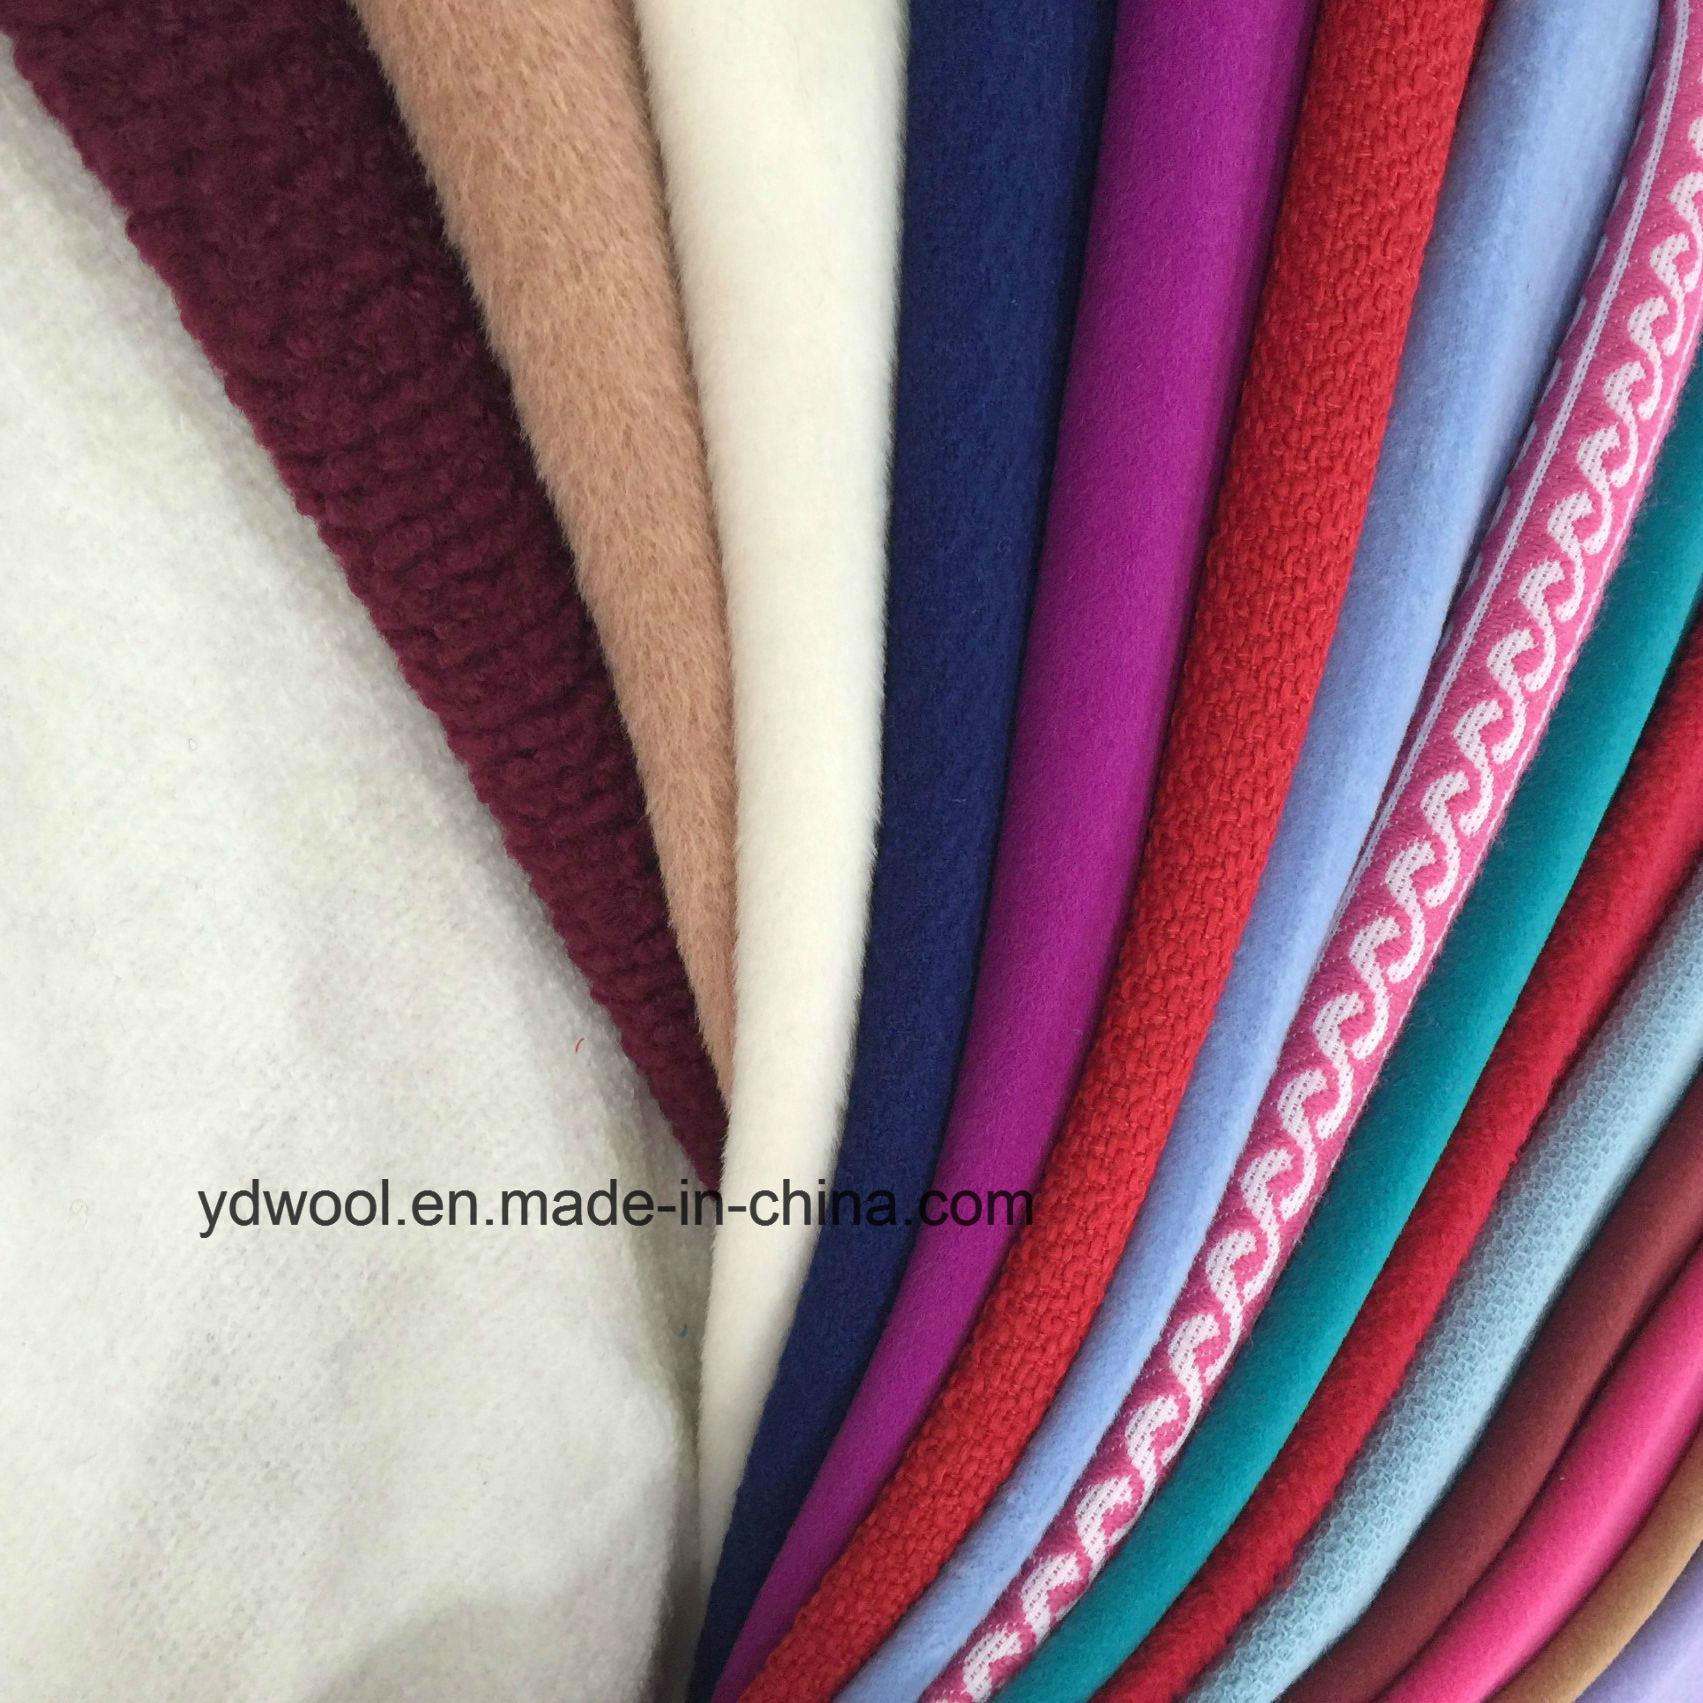 Woollen/ Knitting /Semi-Worsted Ready Greige Fabric